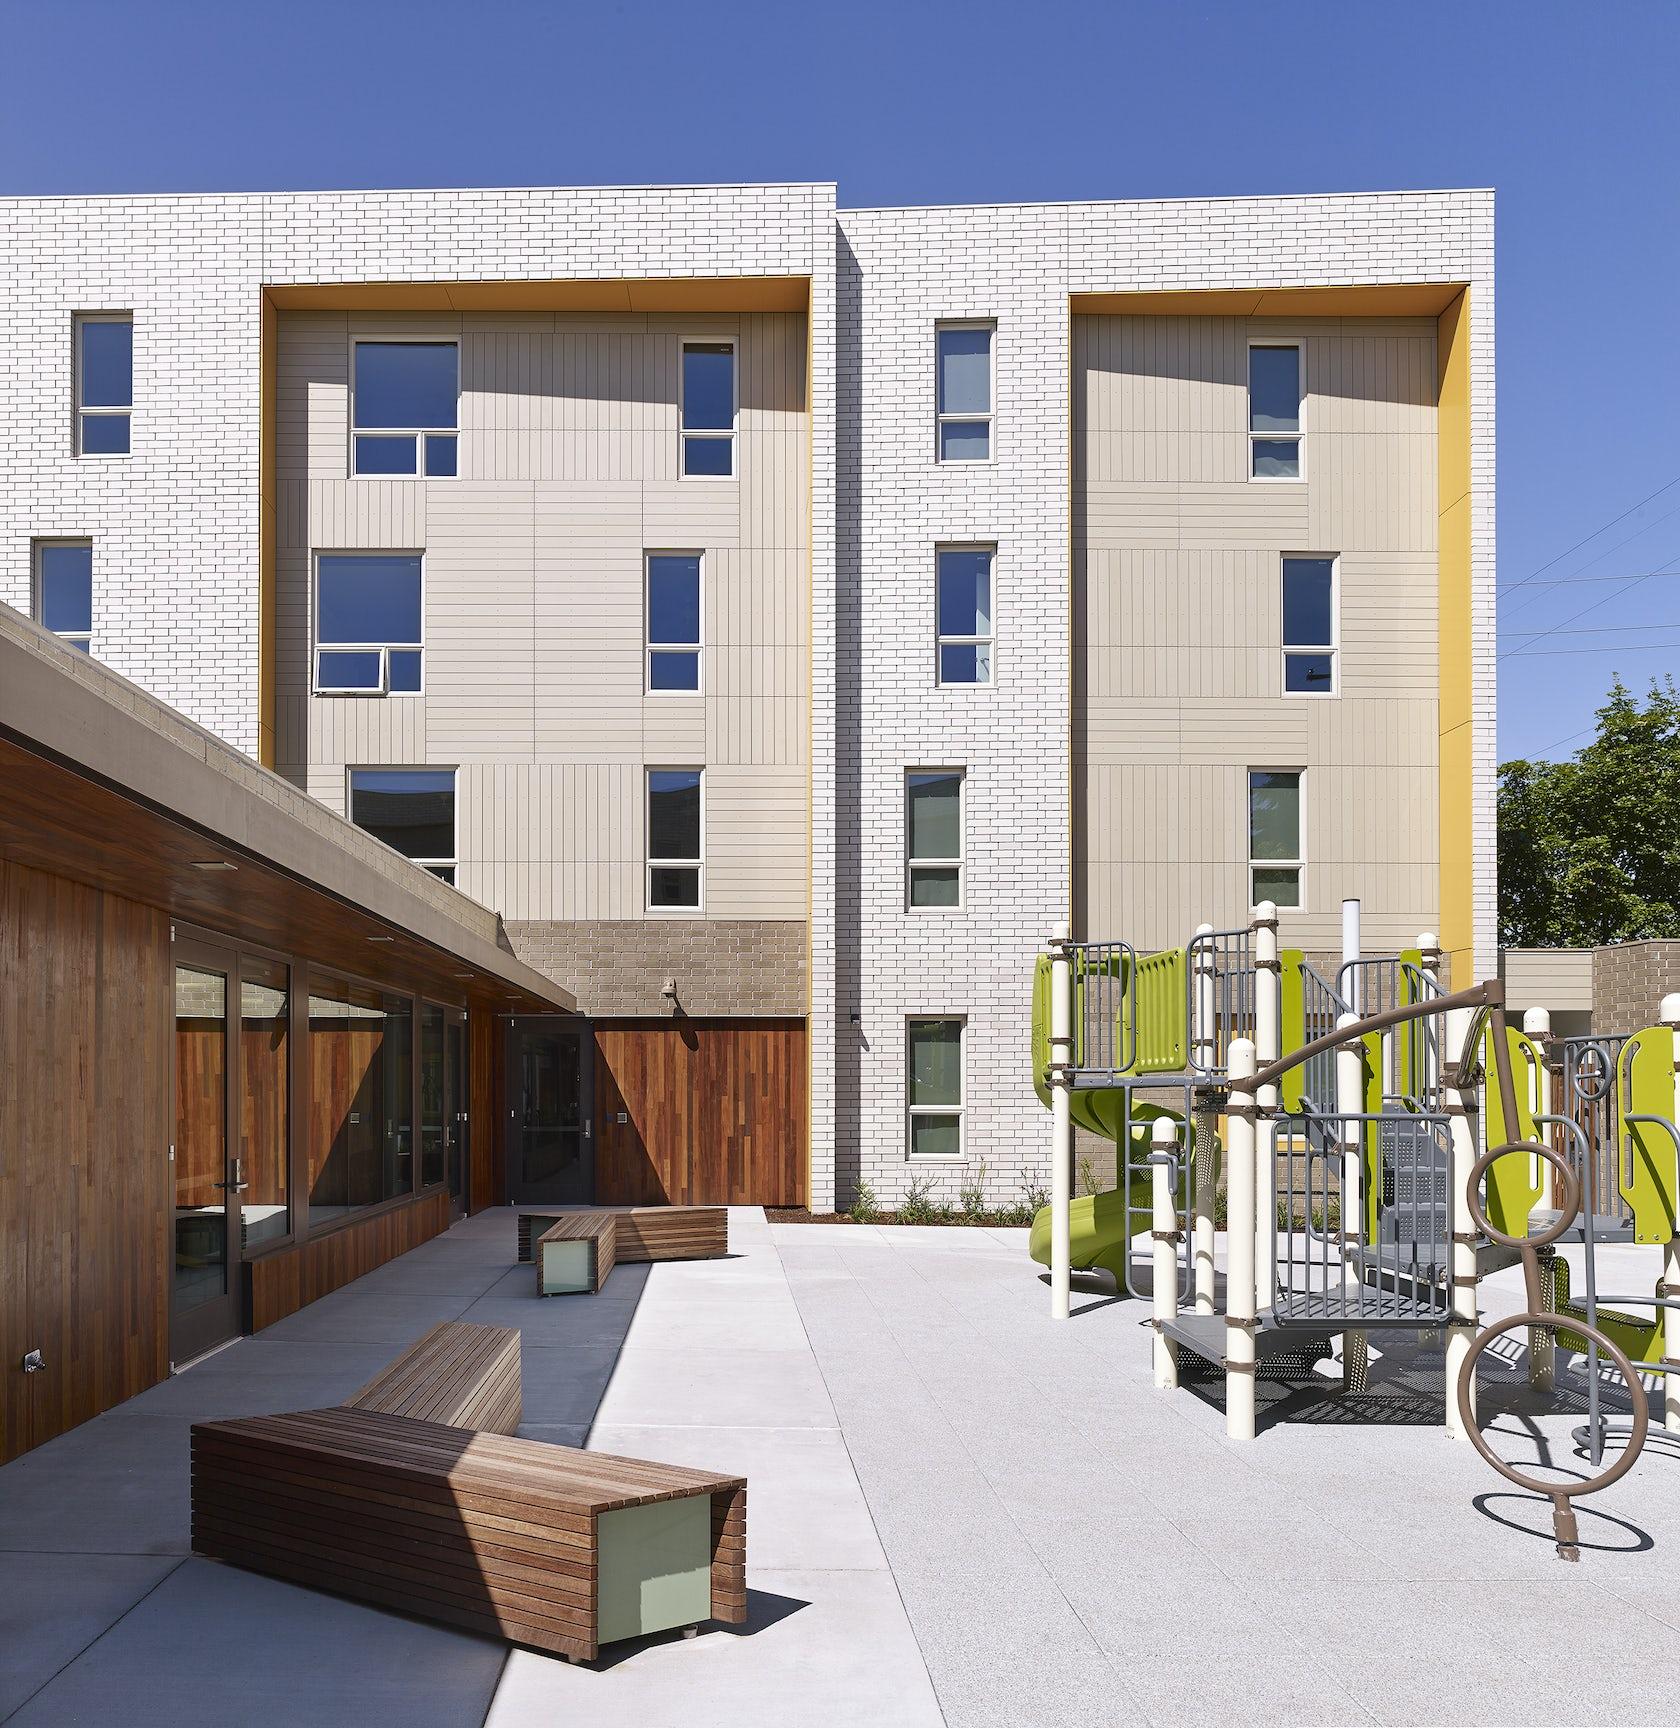 Street Housing: Beech Street Apartments / LifeWorks NW